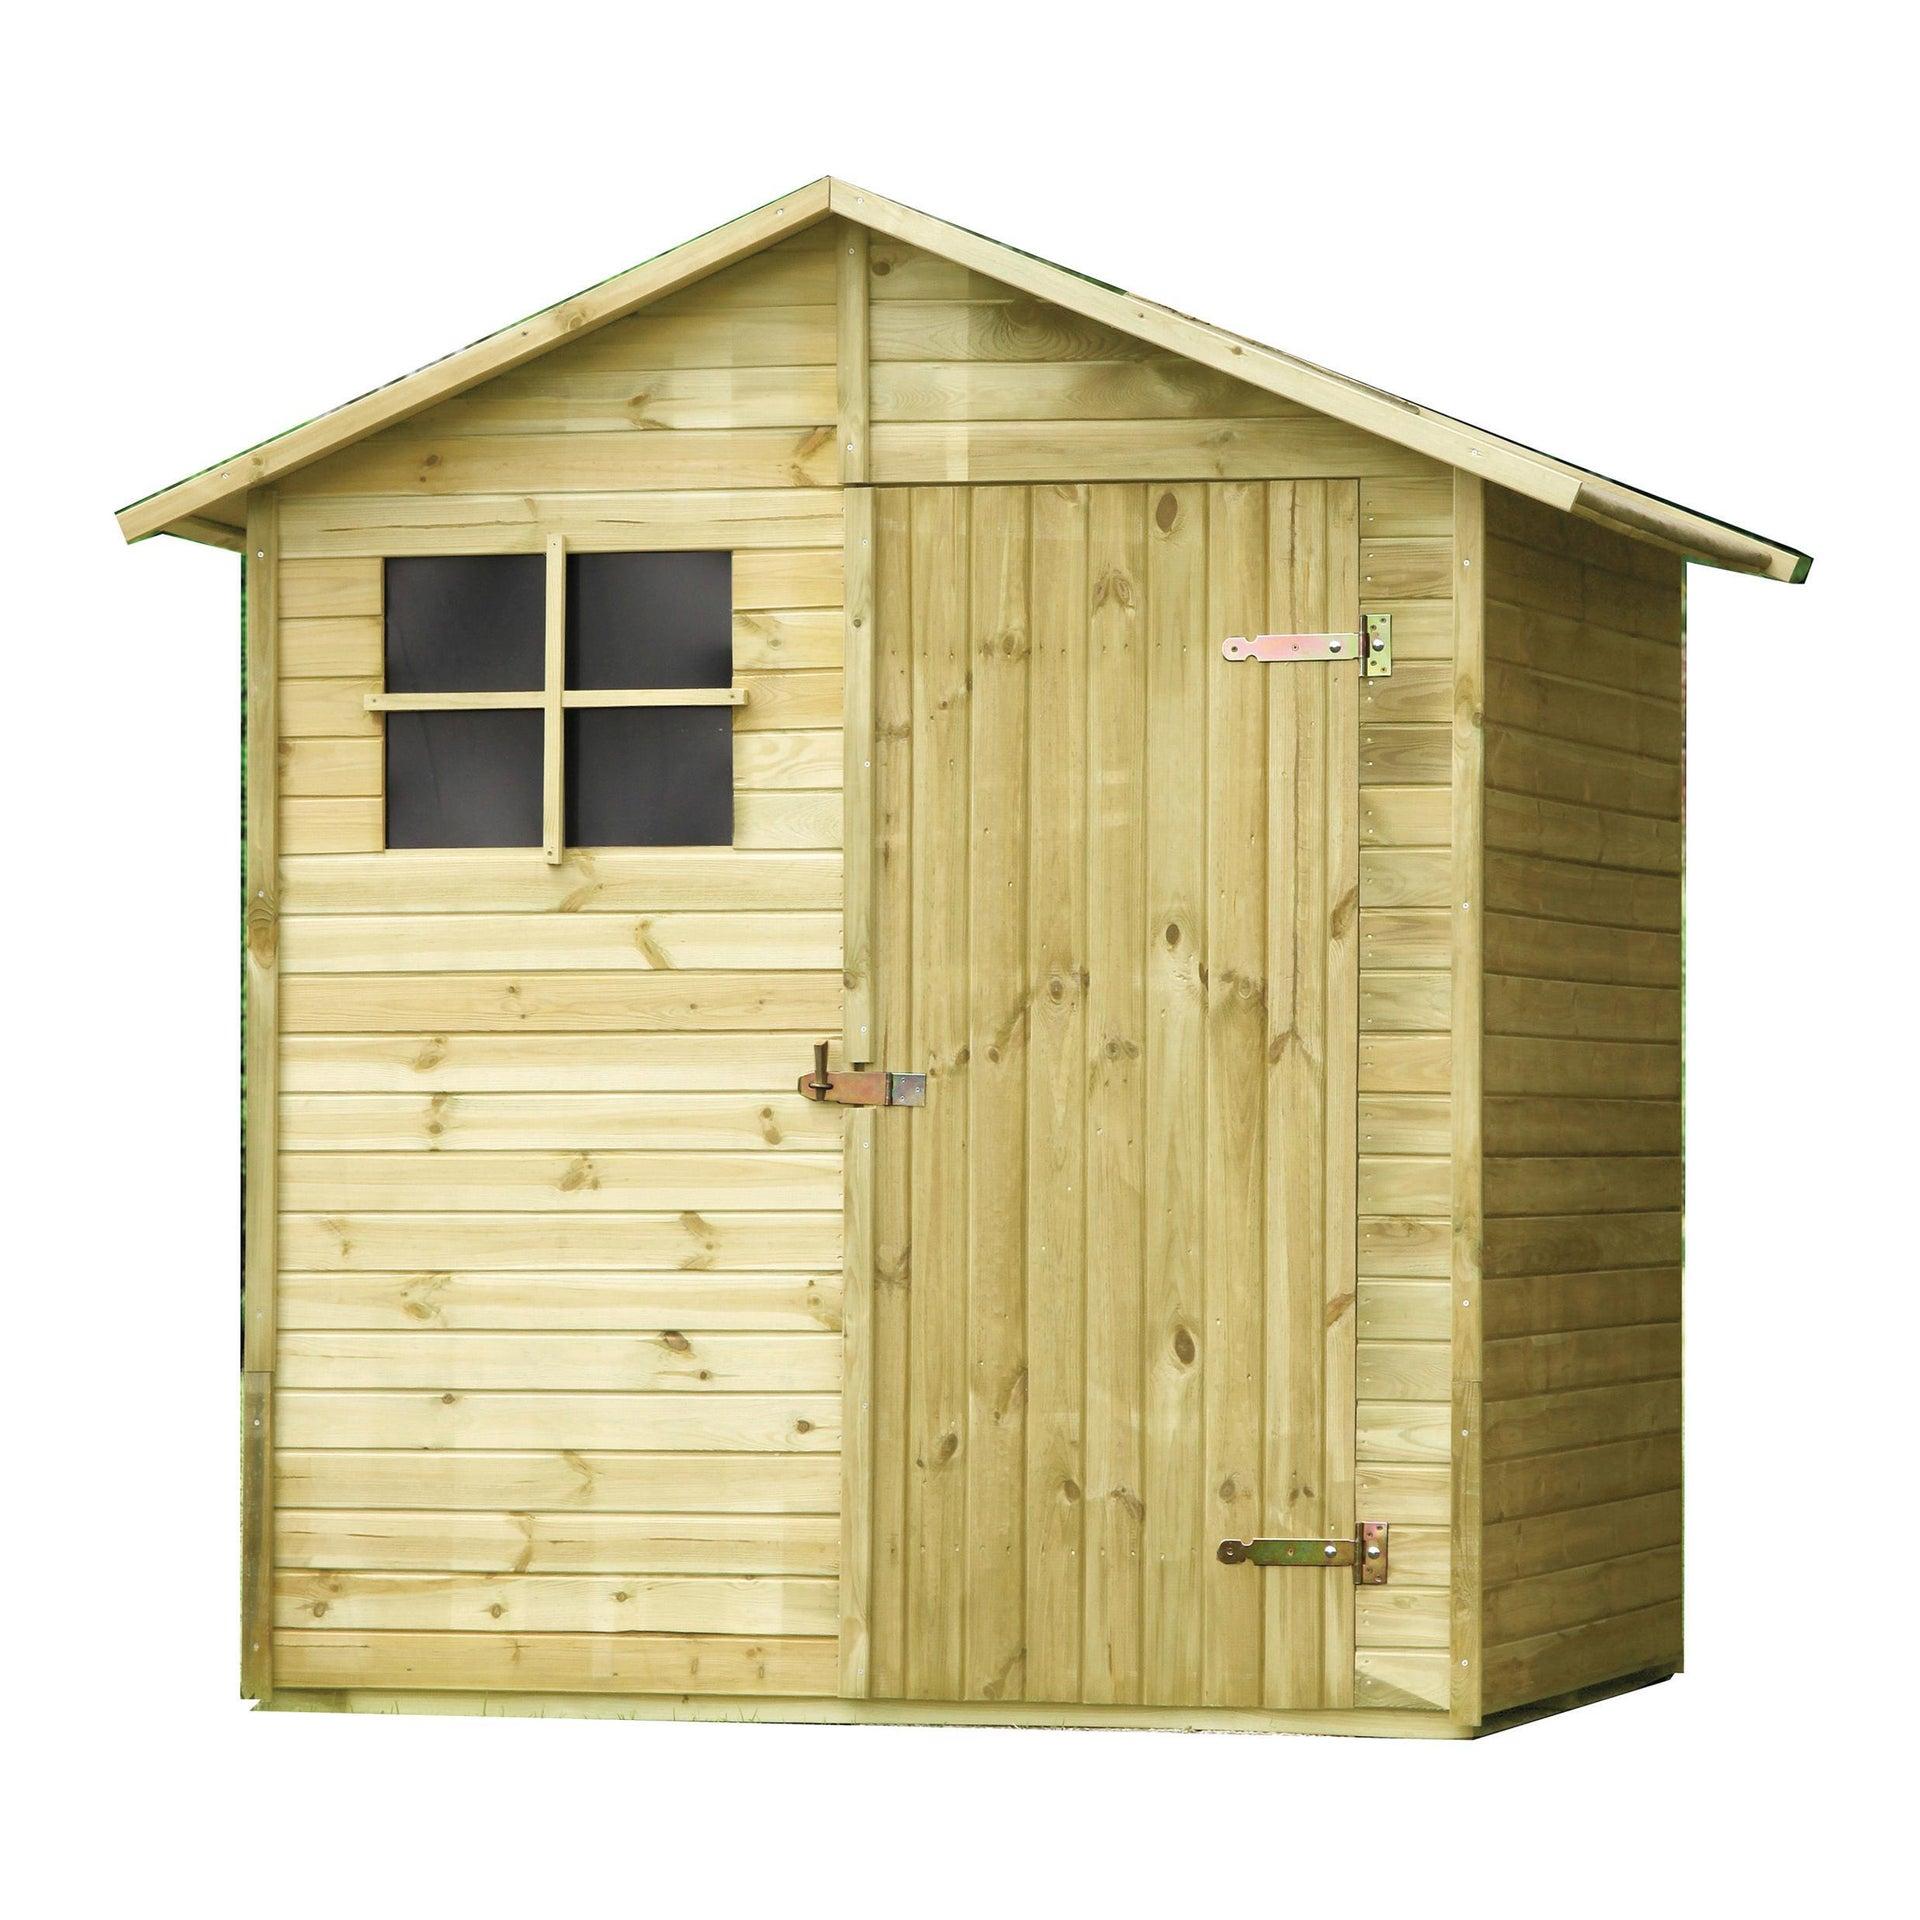 Casetta da giardino in legno Pepper,  superficie interna 1.72 m² e spessore parete 14 mm